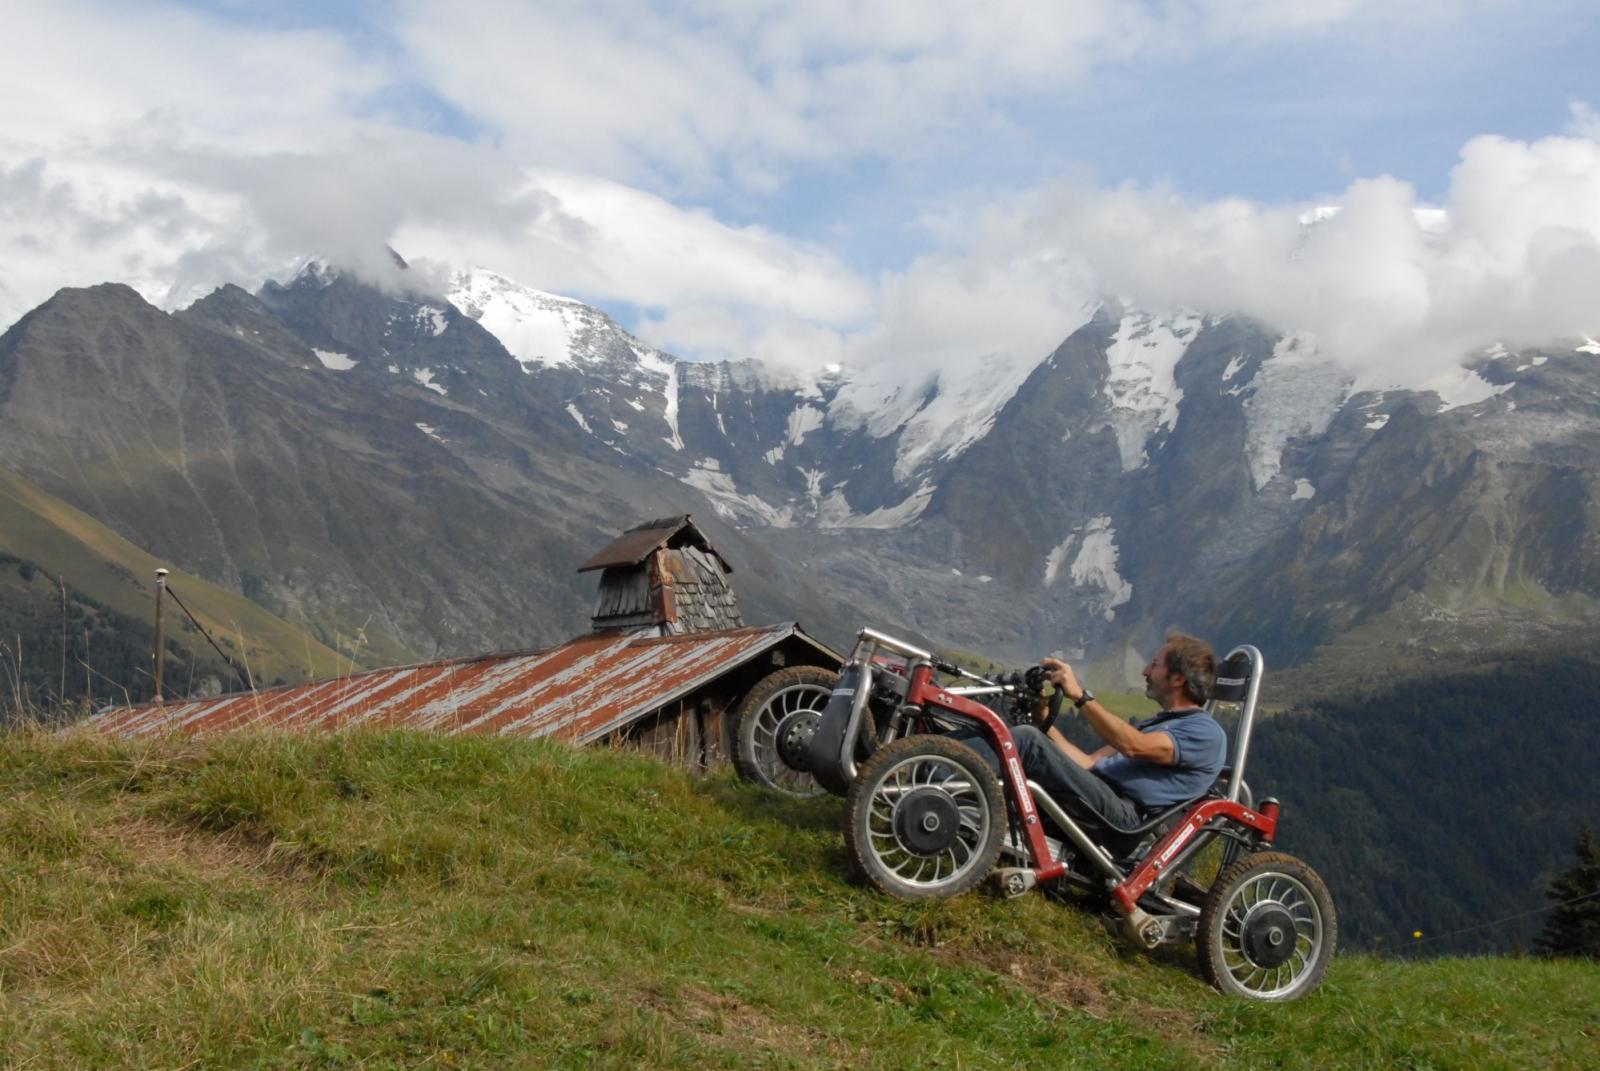 Swincar climbs the Alps with crazy suspension